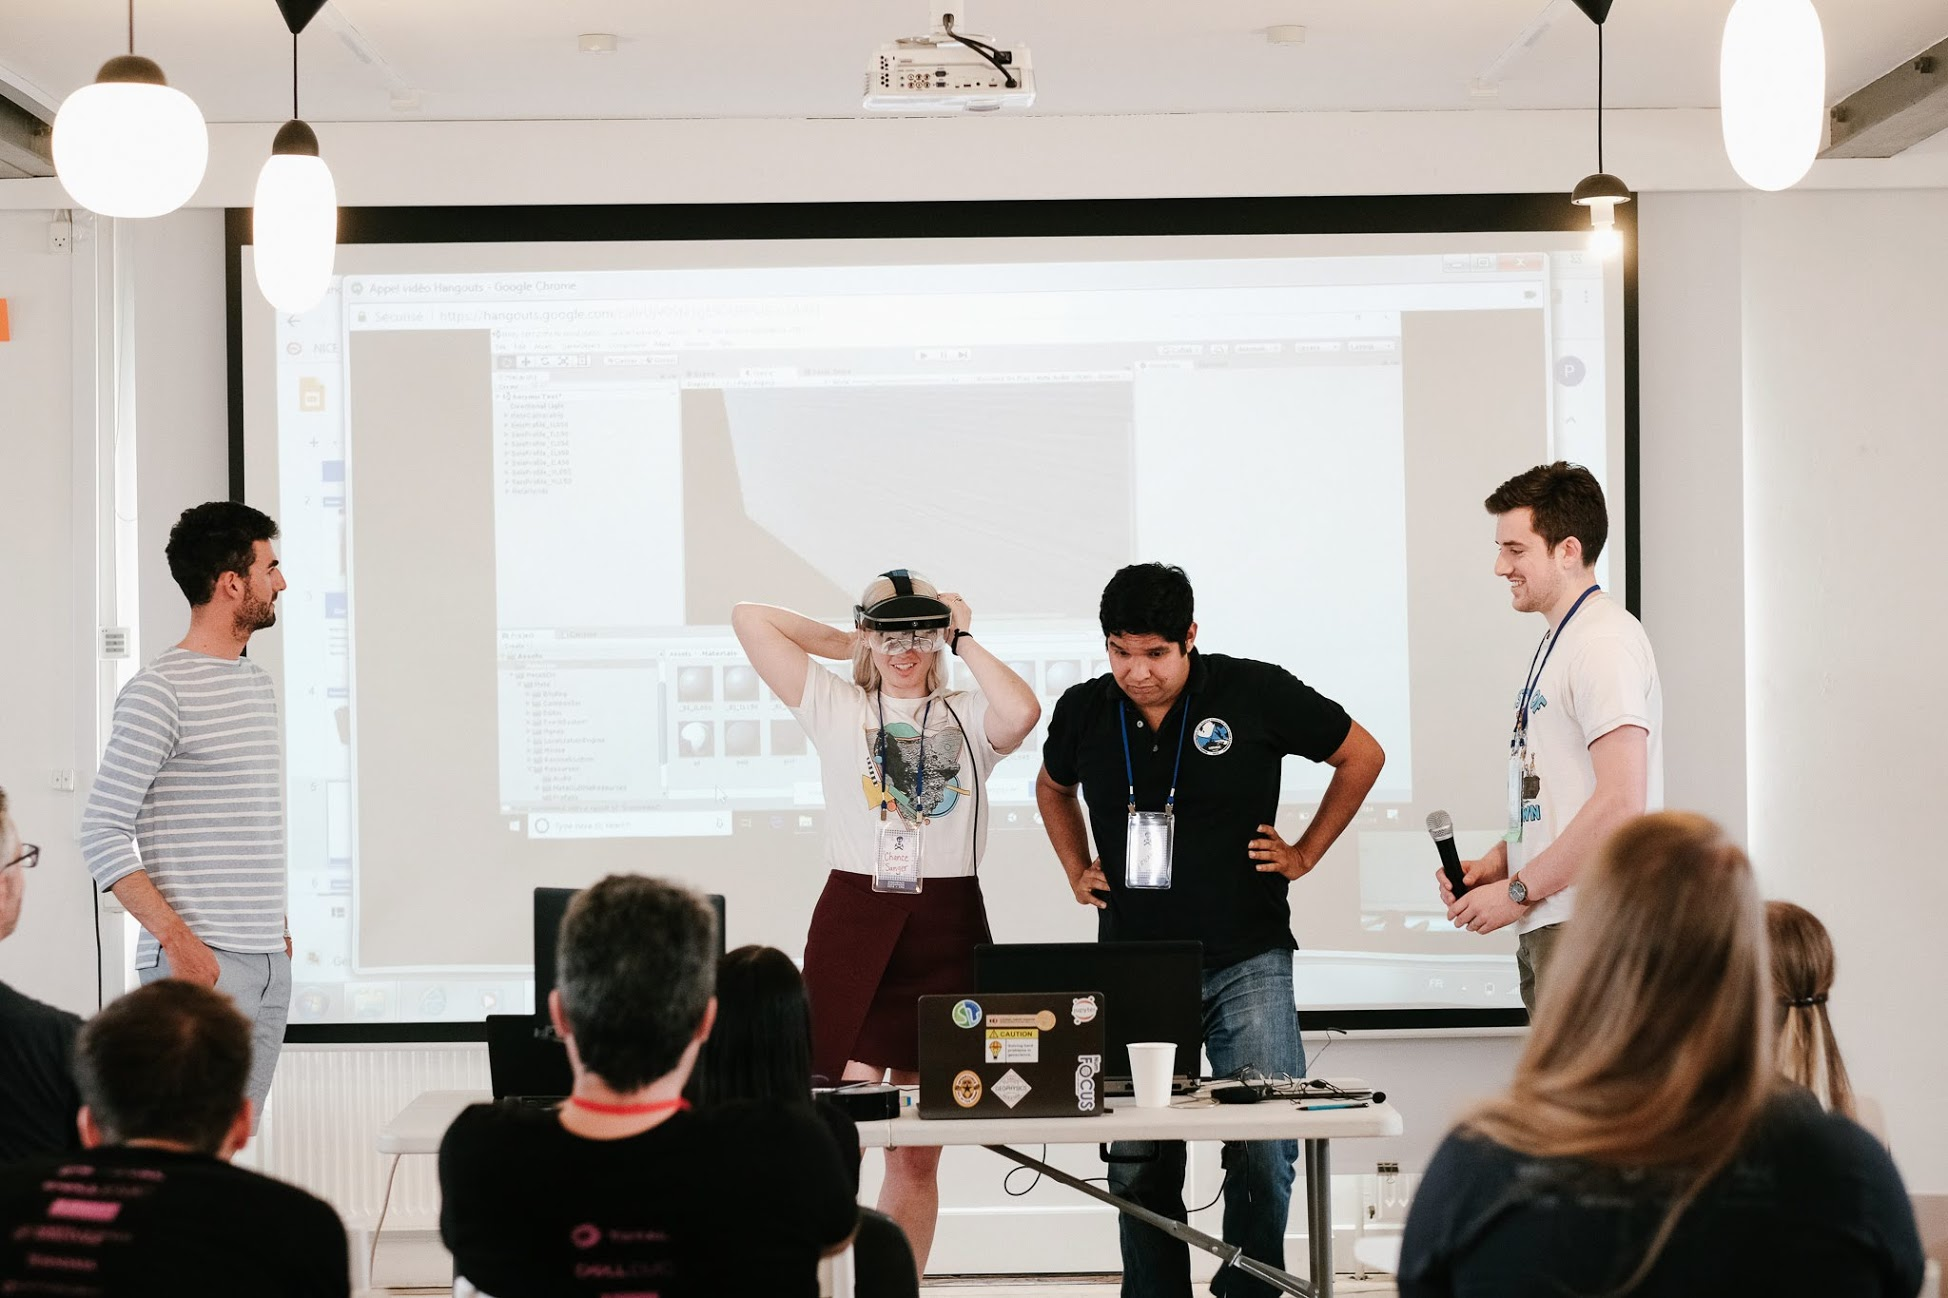 The team demonstrate the Meta AR headset.